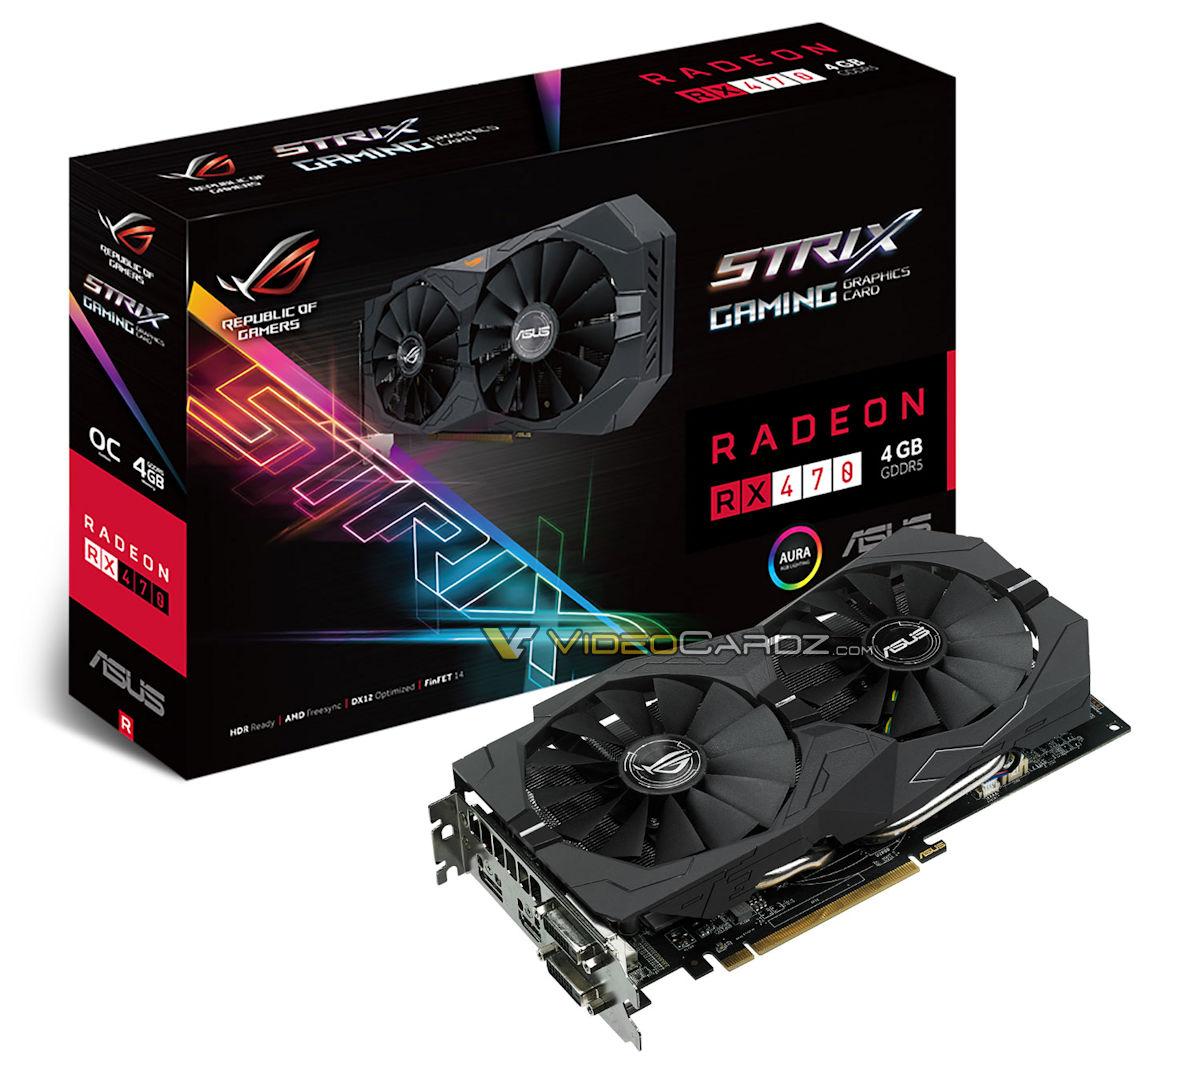 ... STRIX RX 470, Gigabyte RX 470 G1 Gaming, XFX RX 470 Black pictured